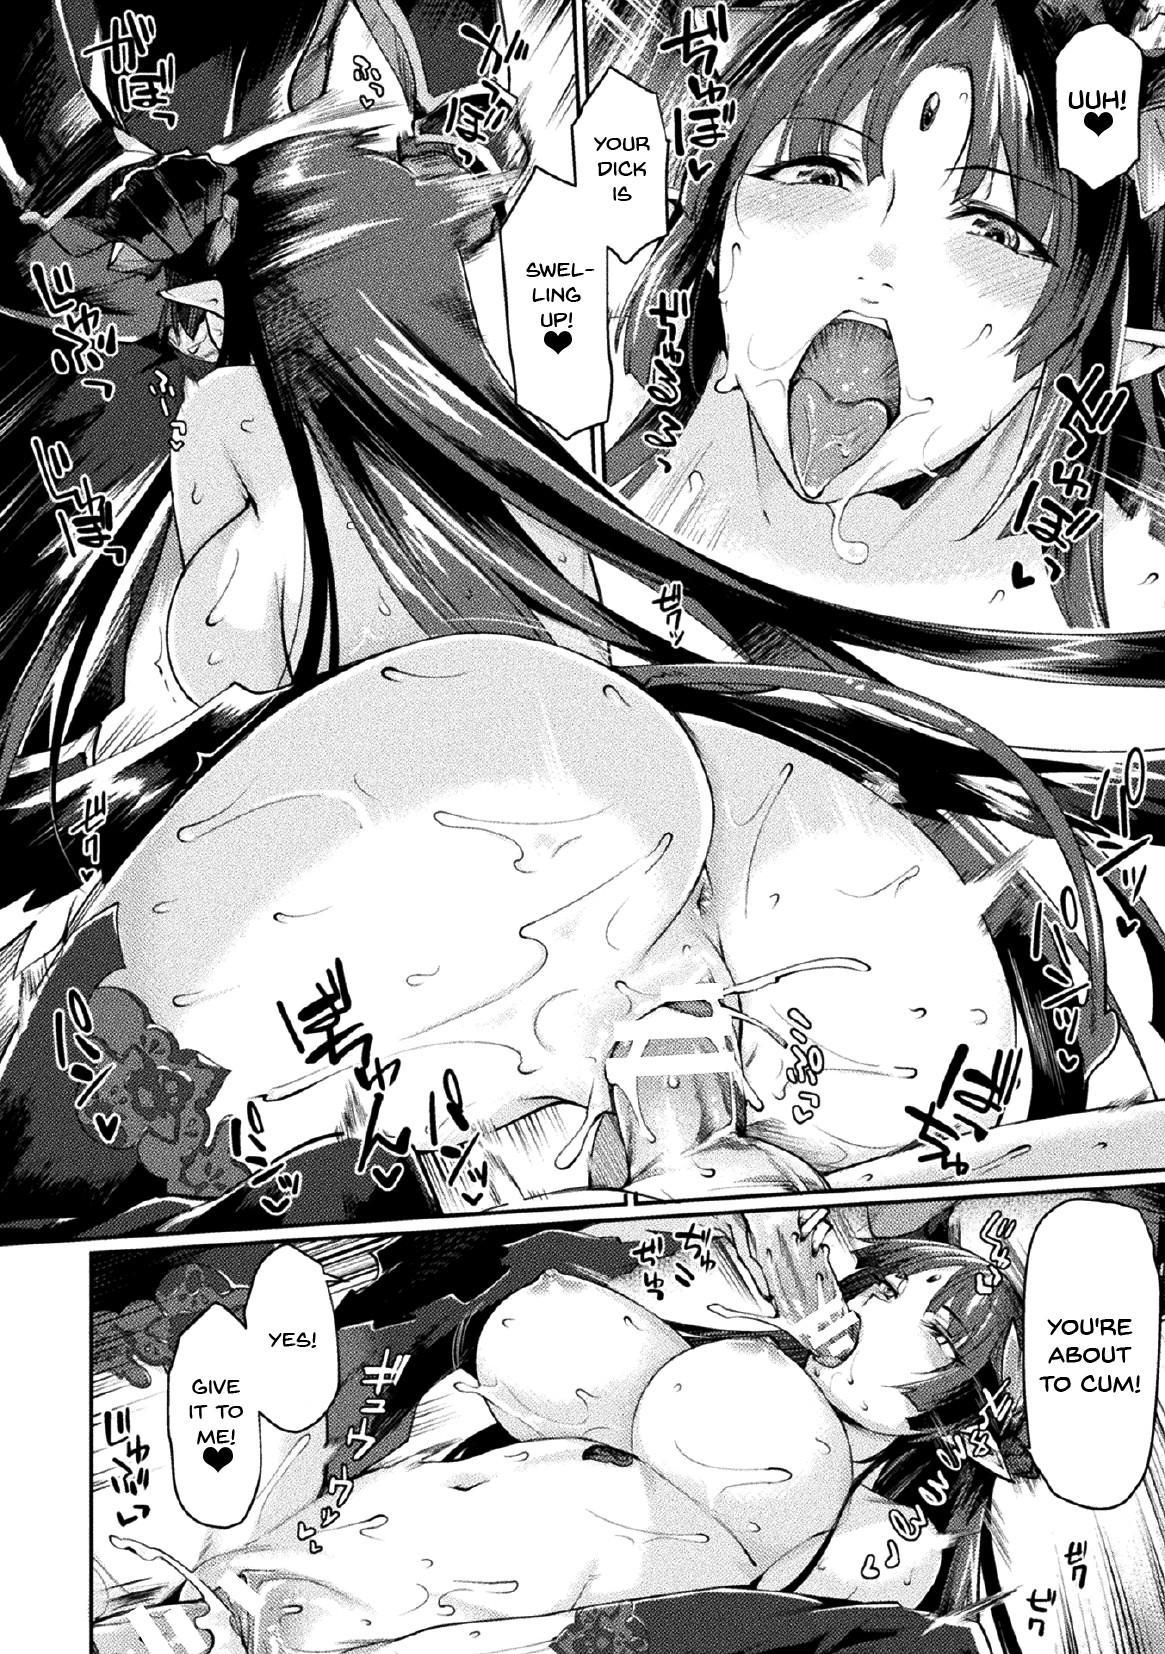 [Tsukitokage] Kuroinu II ~Inyoku ni Somaru Haitoku no Miyako, Futatabi~ THE COMIC   Kuroinu II ~Corrupted Town Stained With Lust~ THE COMIC Ch. 1 (Haiboku Otome Ecstasy Vol. 17) [English] {Doujins.com} [Digital] 13